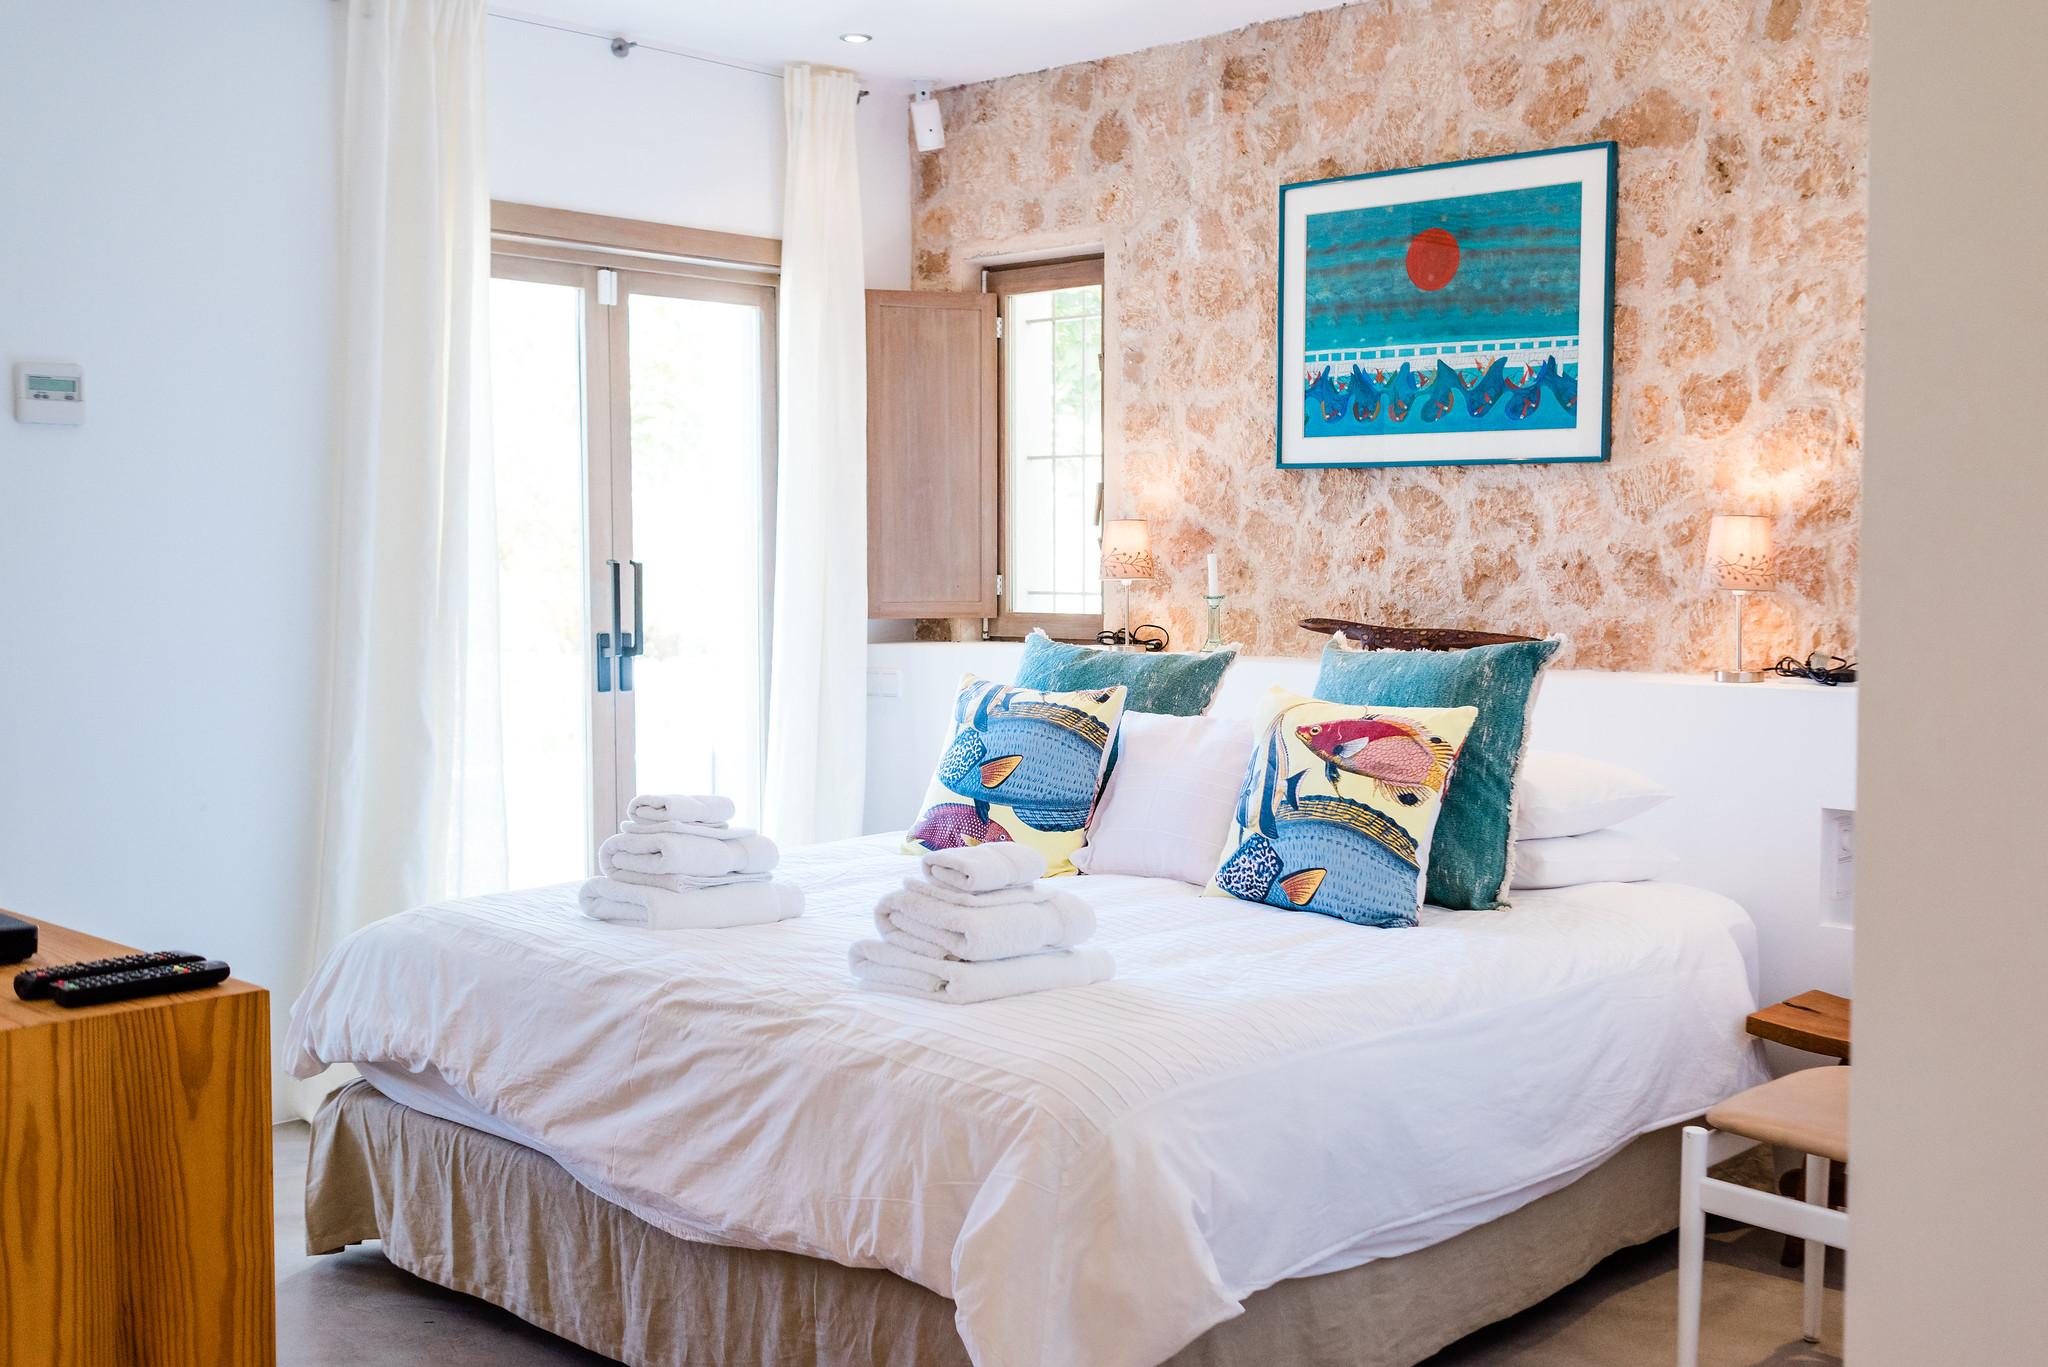 https://www.white-ibiza.com/wp-content/uploads/2020/06/white-ibiza-villas-casa-nyah-interior-bedroom12.jpg